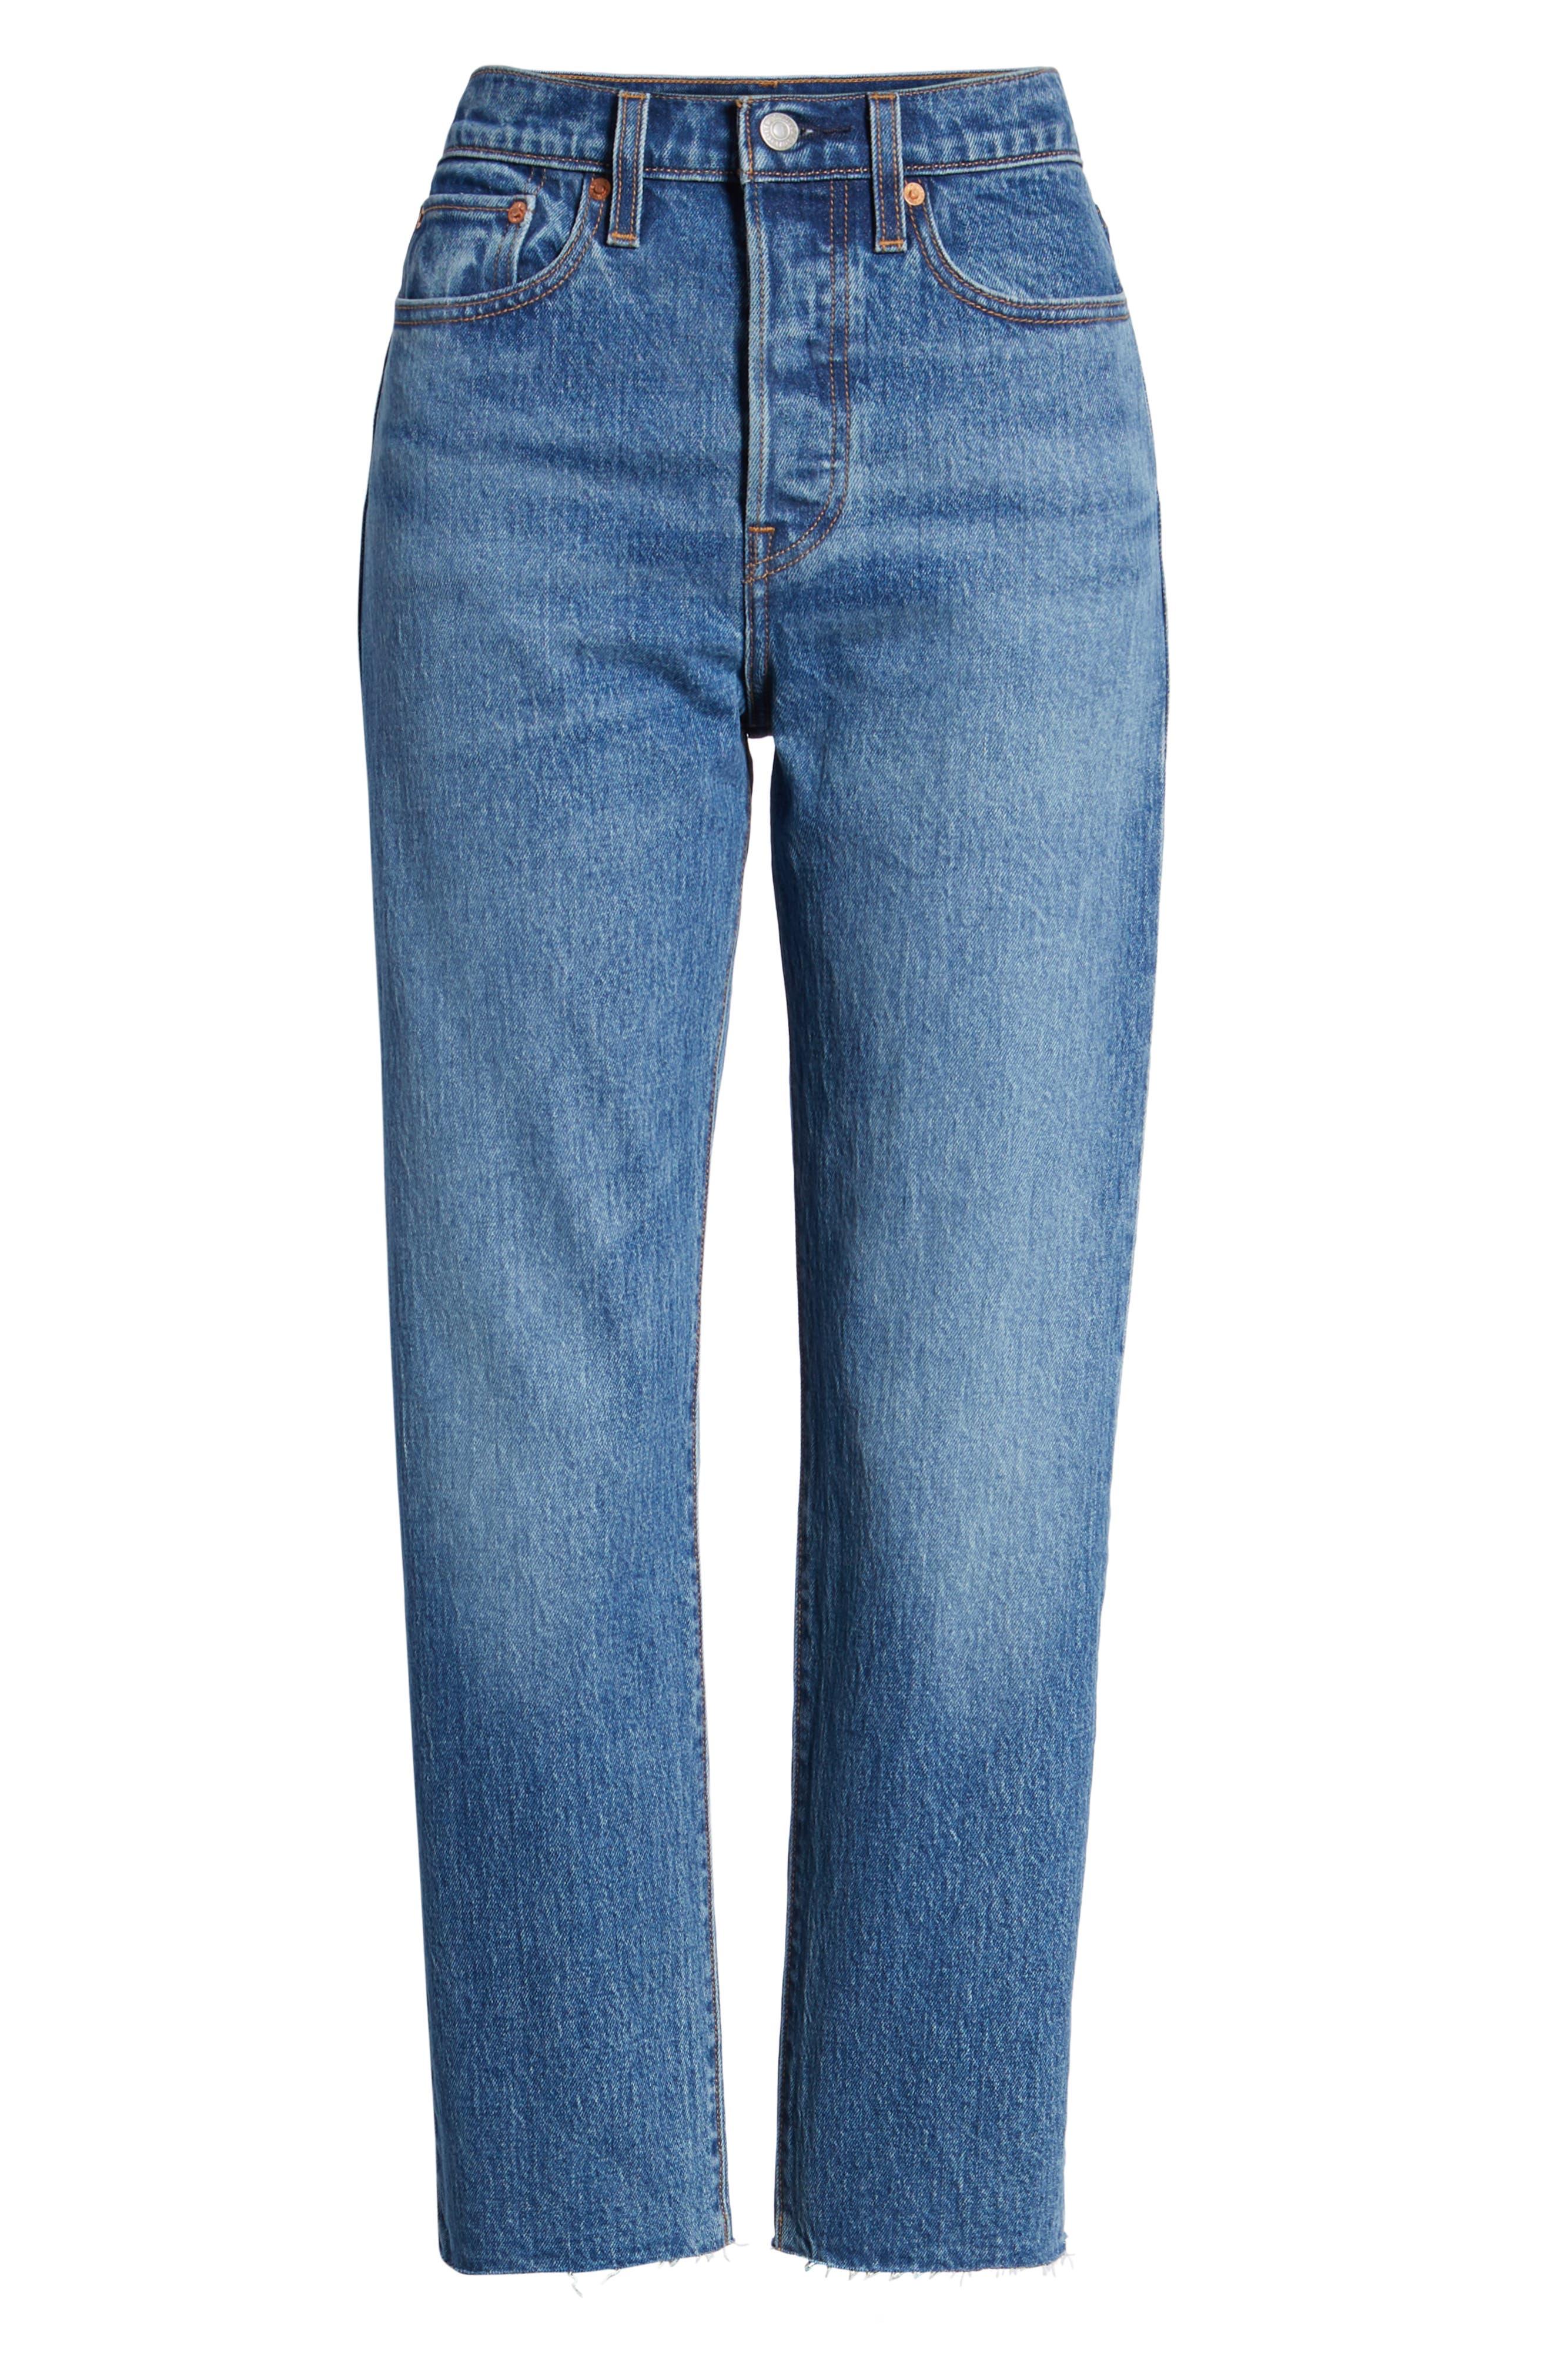 Wedgie Raw Hem High Waist Straight Leg Jeans,                             Alternate thumbnail 7, color,                             LOVE TRIANGLE